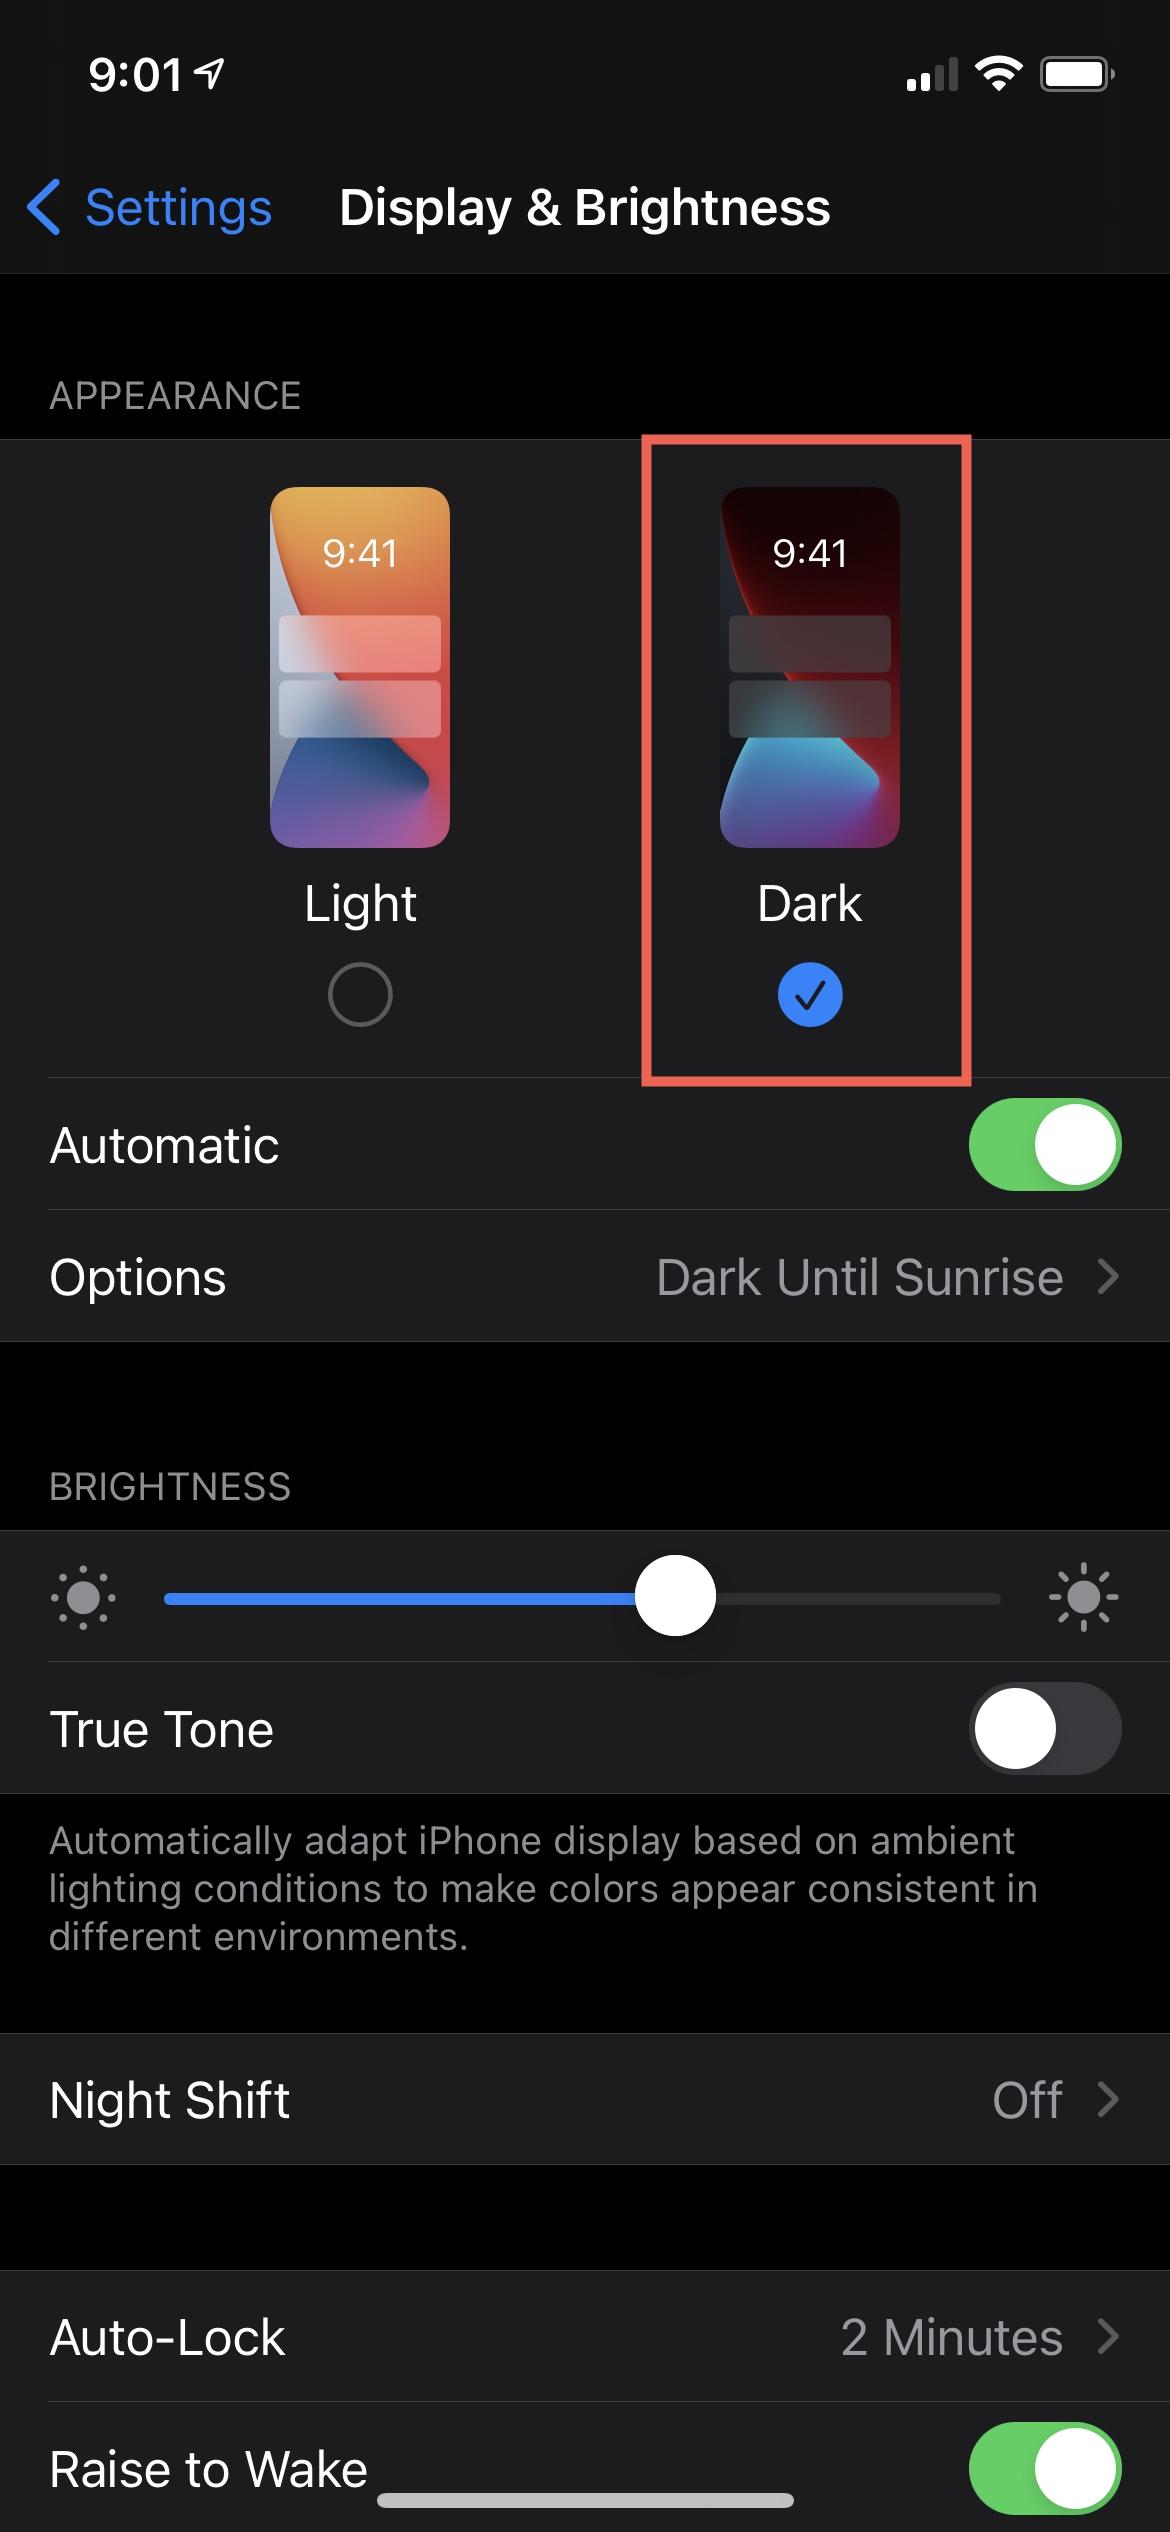 iPhone 12 Display and Brightness Dark